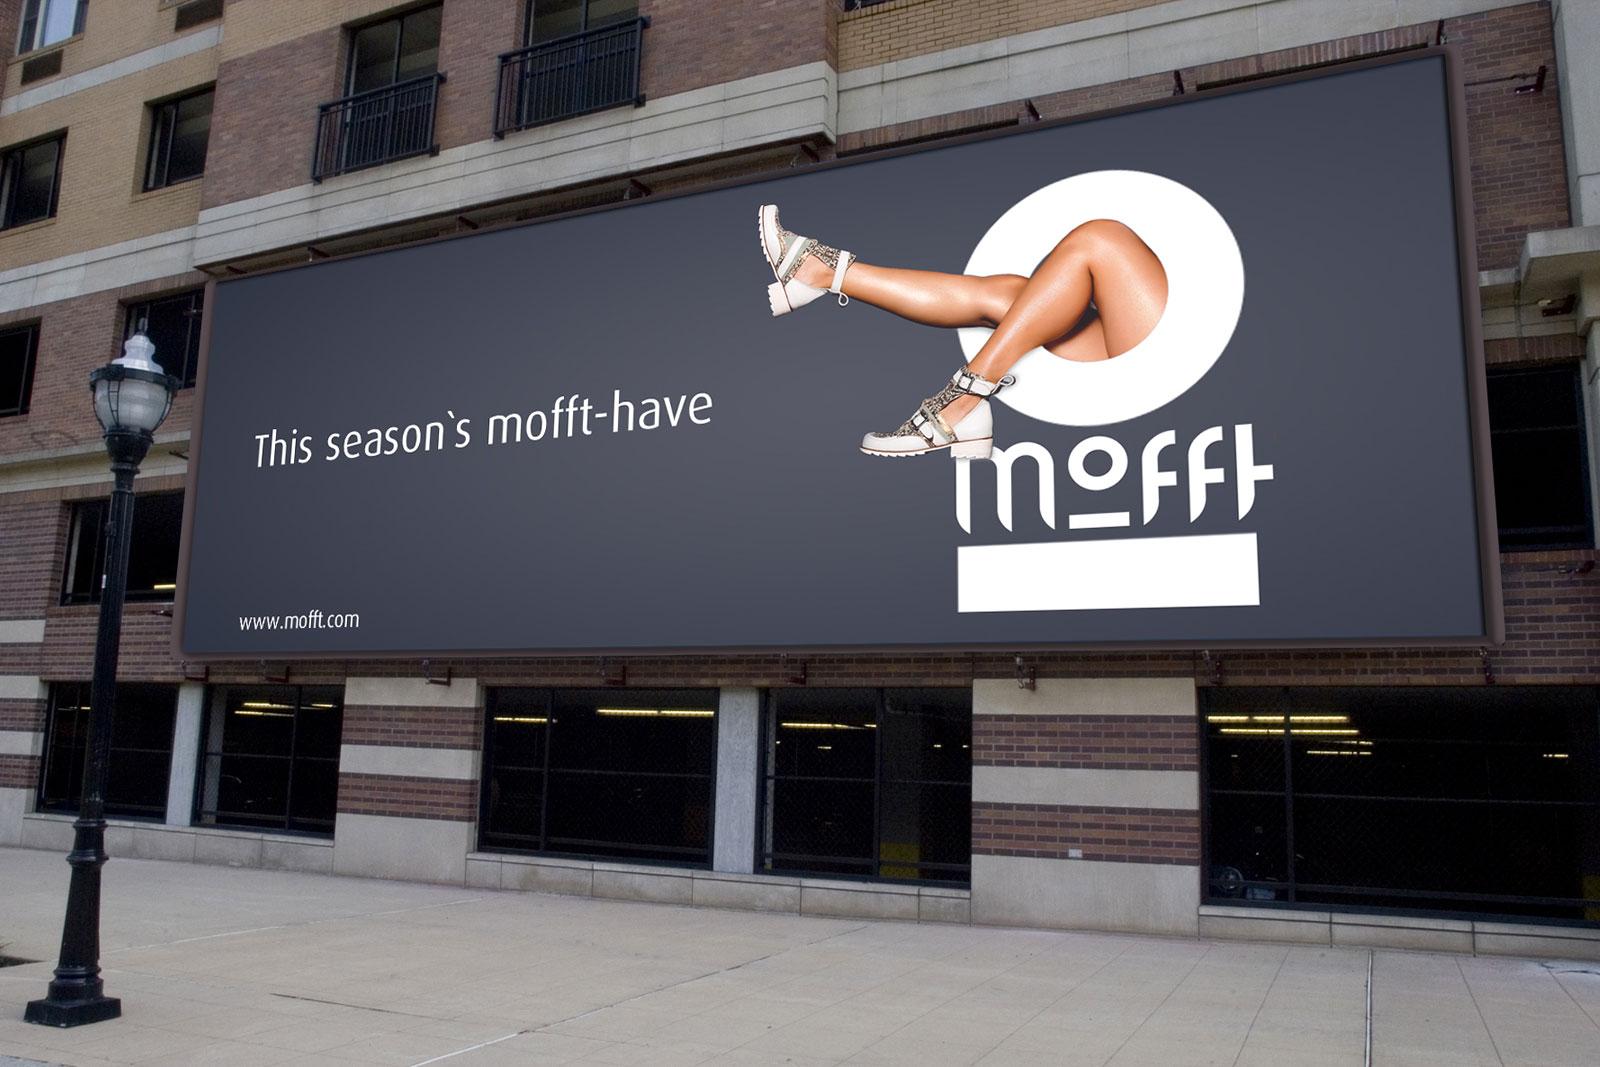 mofft fashion inoveo header